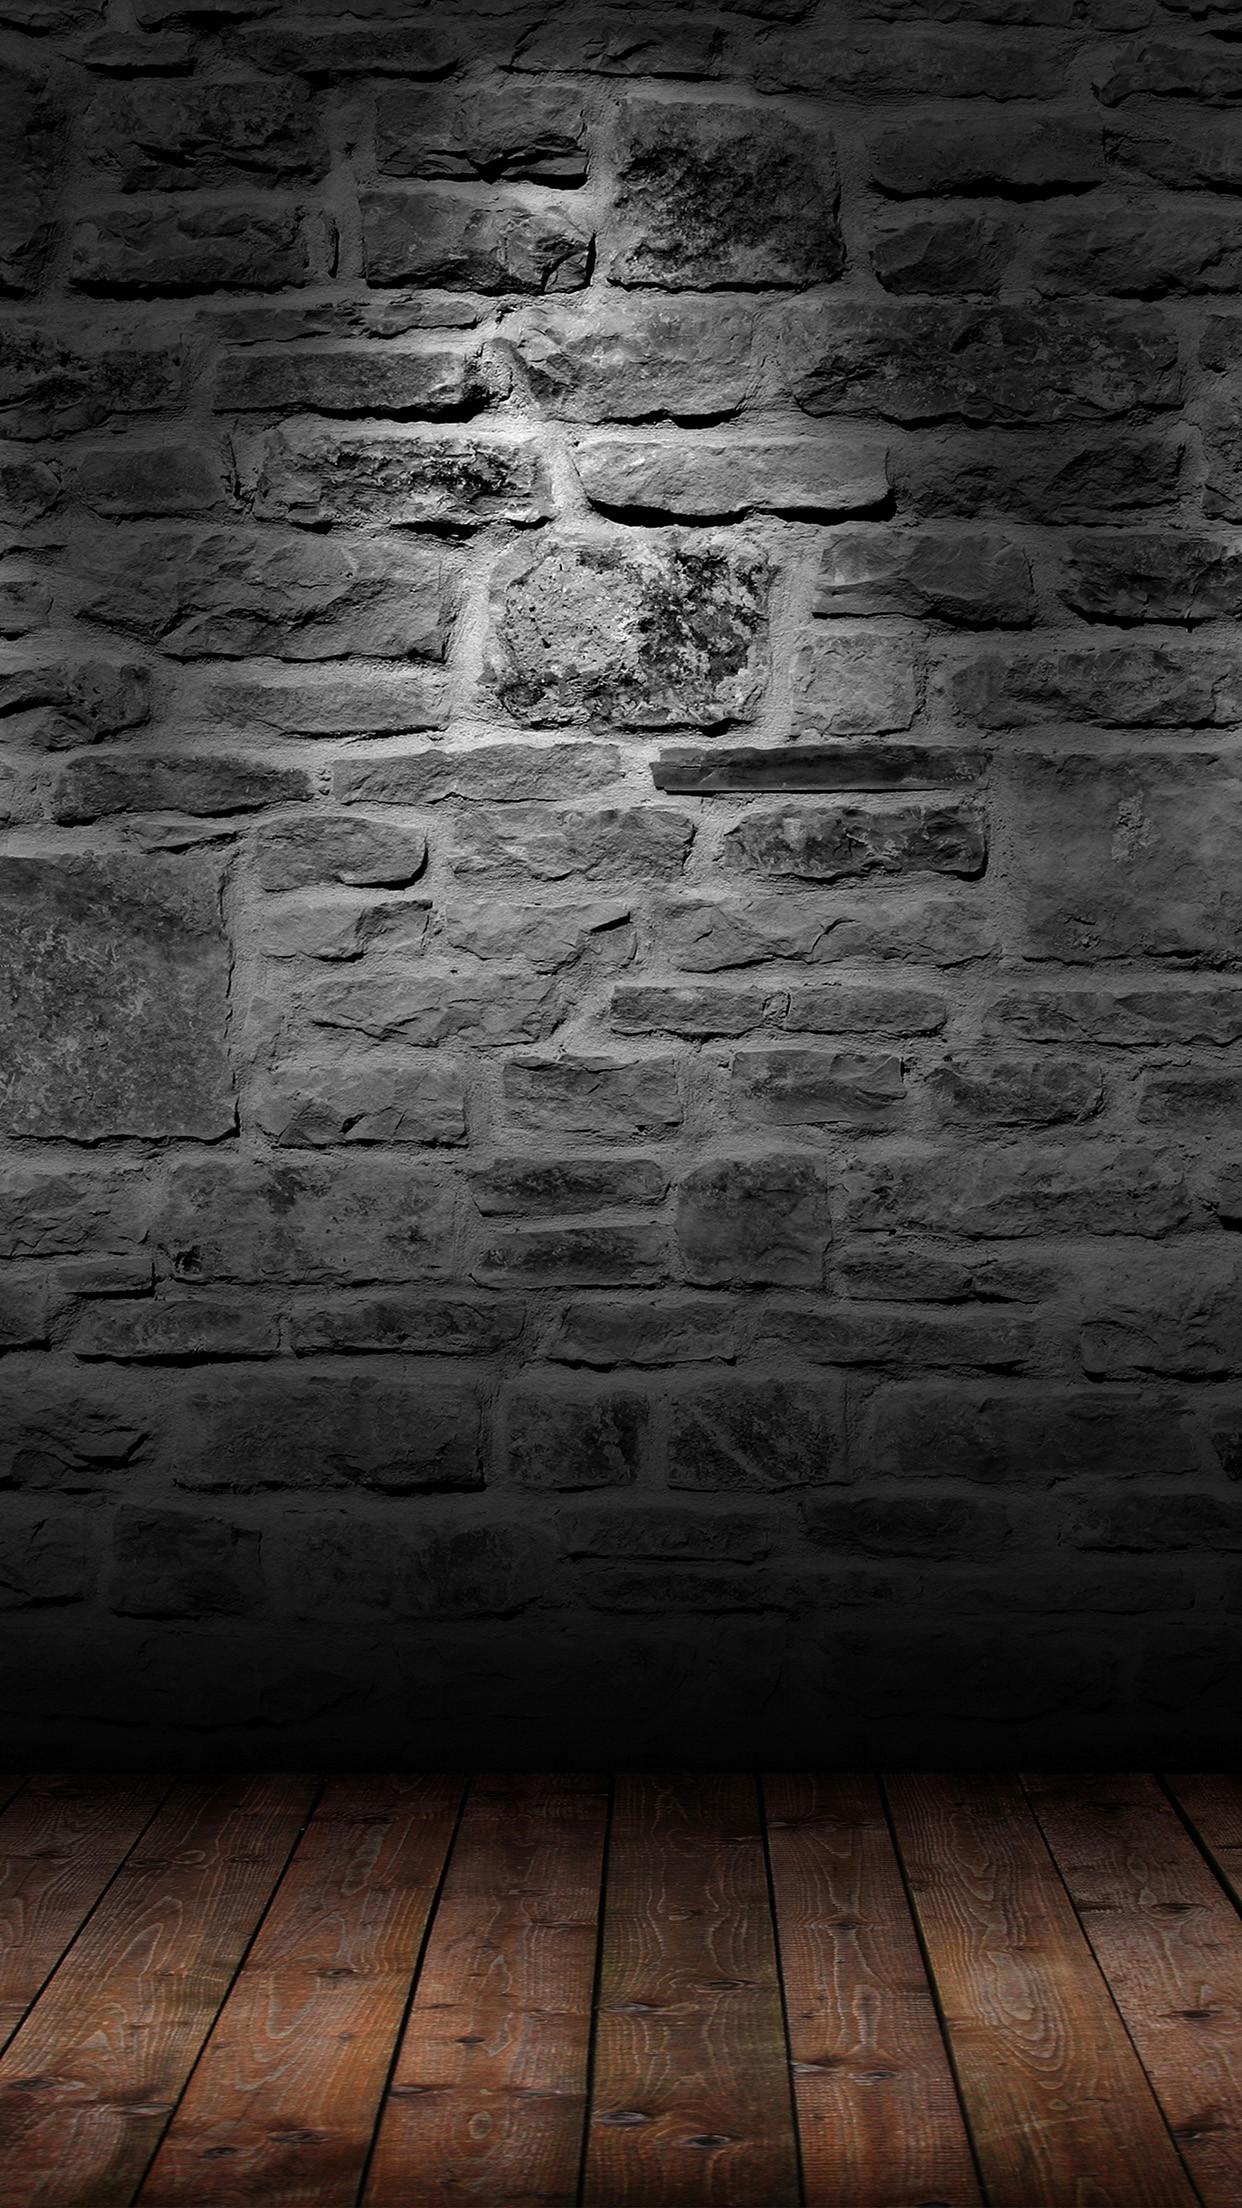 Dark Brick Wall Wood Floor Android Wallpaper …